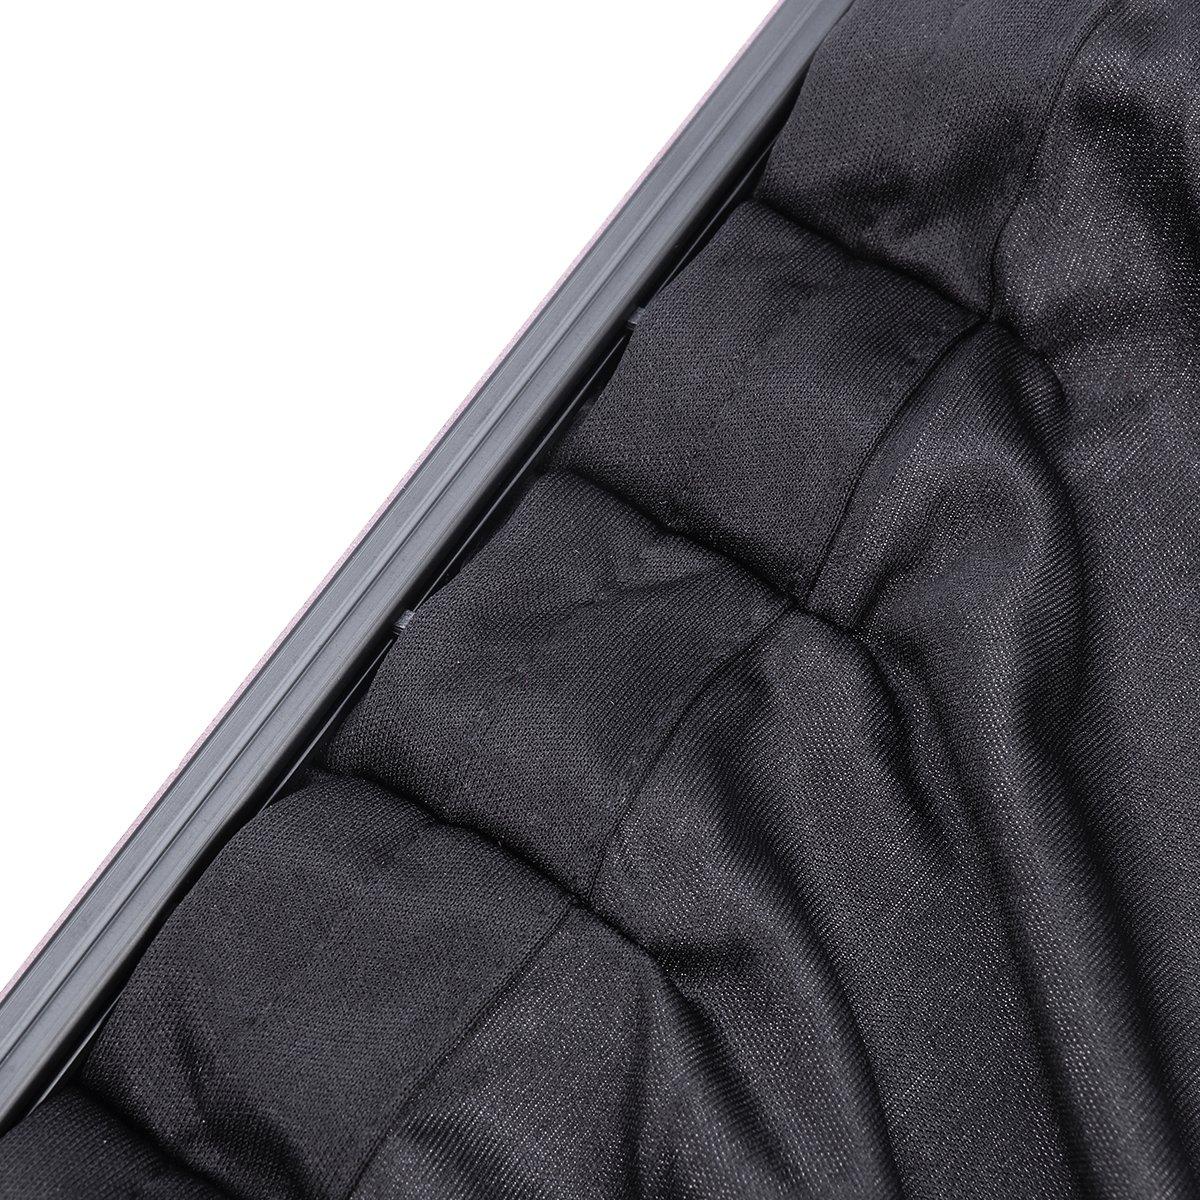 WINOMO 2pcs Car Side Window UV Protection Curtain Sun Shade Vehicle Slidable Window Shield for Sedan SUV